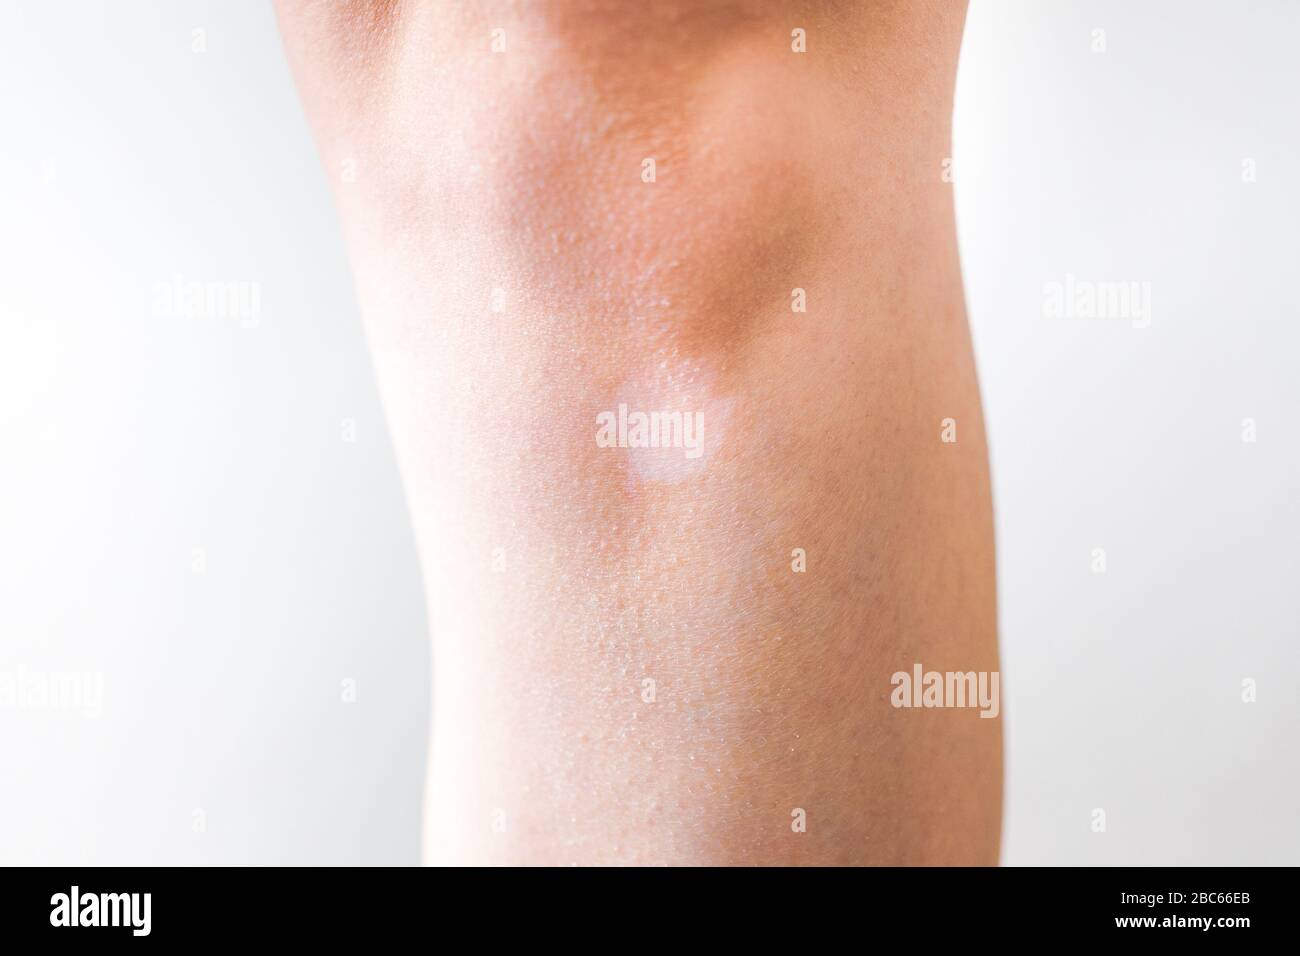 White Vitiligo Spot On The Skin Lack Of Melanin Stock Photo Alamy